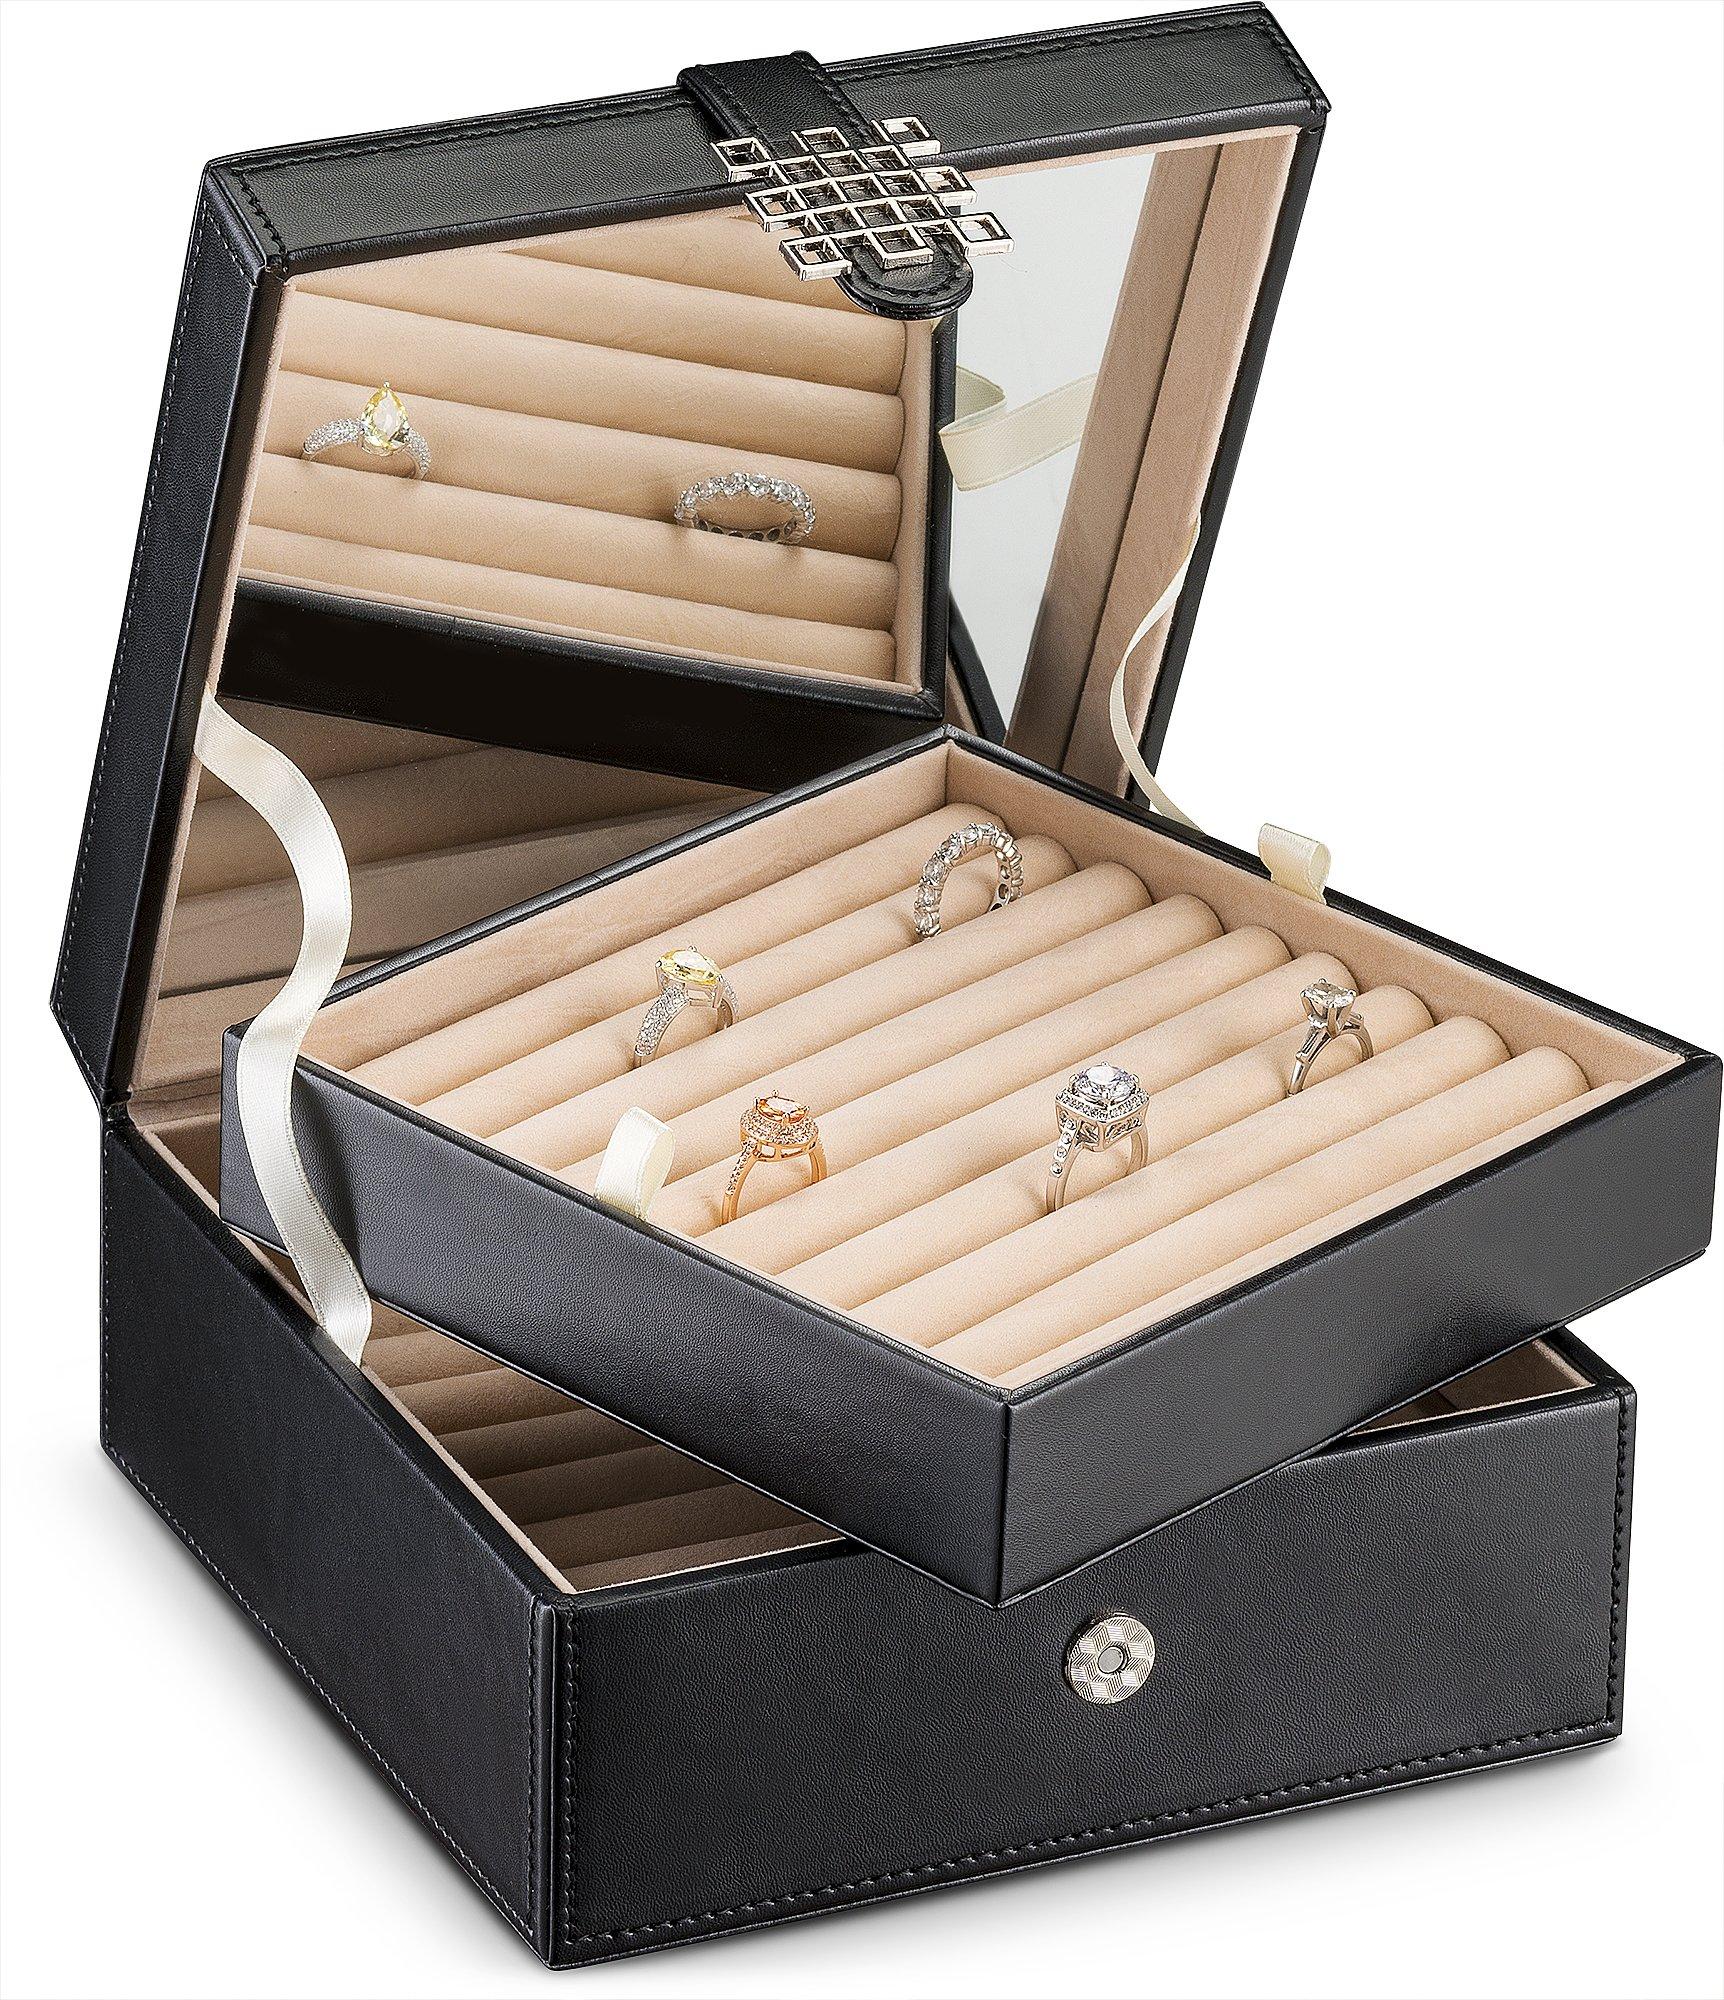 Glenor Co Ring Organizer Box - 108 Slot Classic Jewelry Display Holder - 2 Storage Trays Modern Buckle Closure, Large Mirror - Holds Rings Cufflinks - PU Leather Case - Black